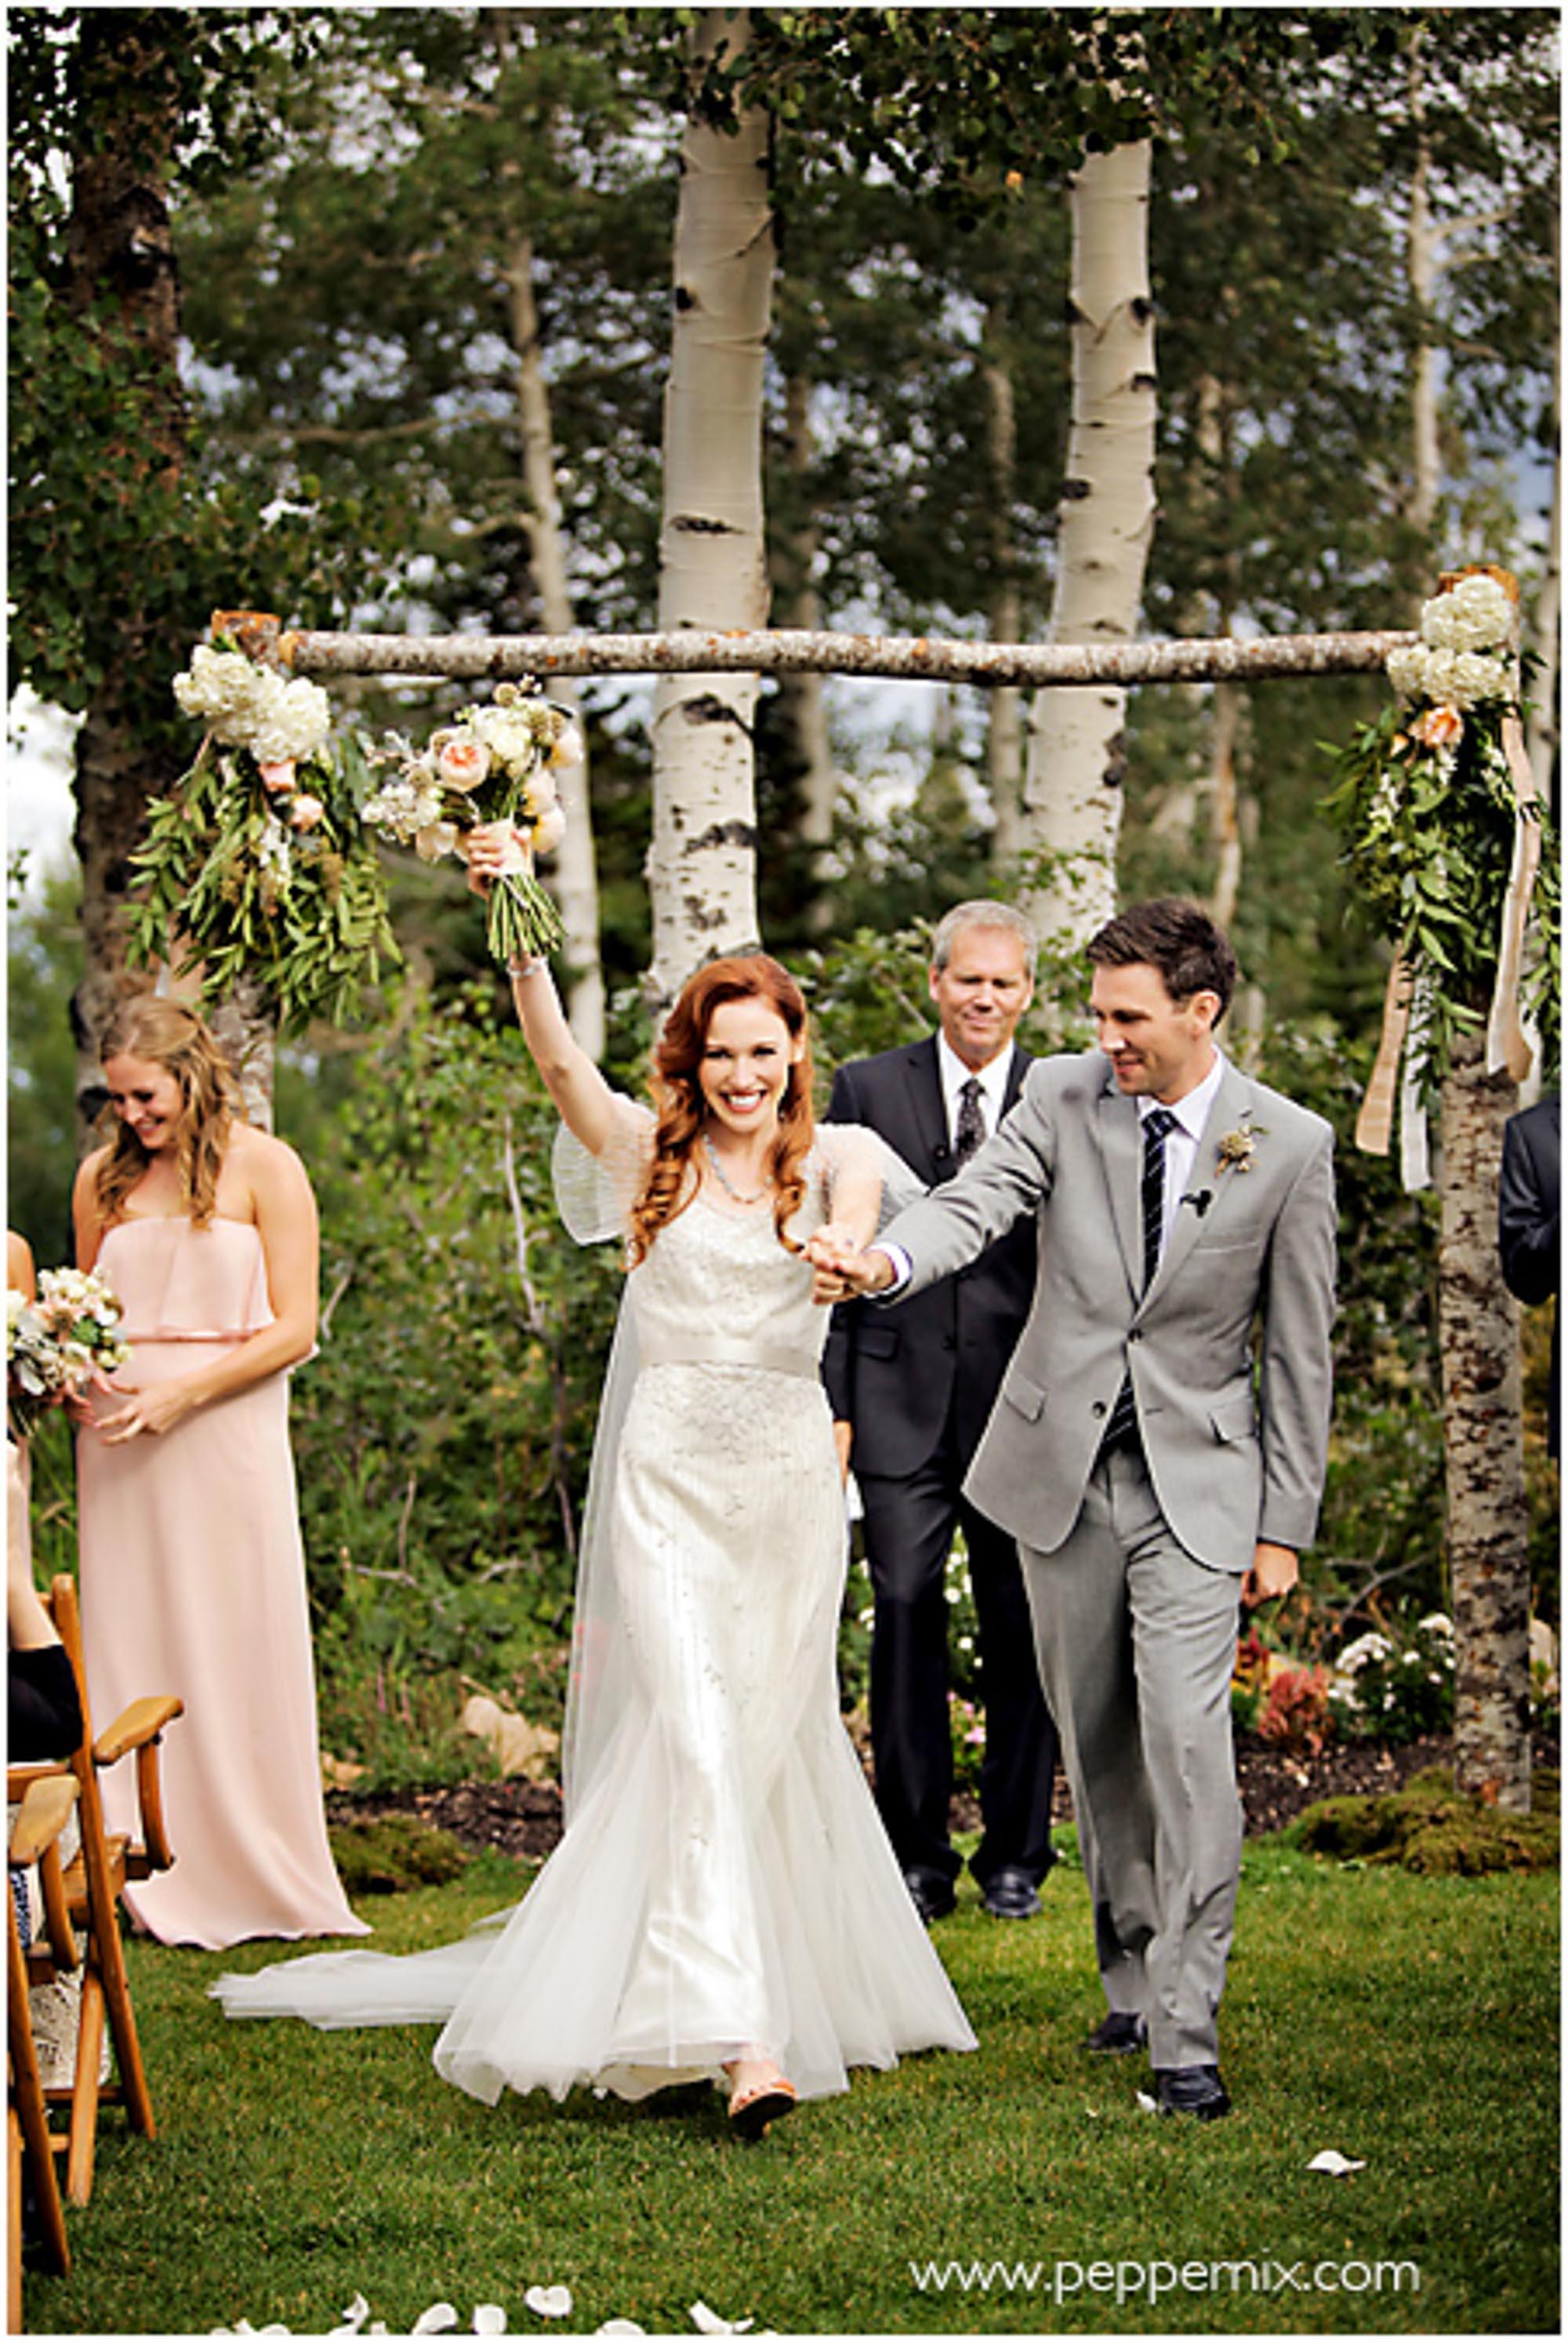 Summer Weddings Haugen Park City PNP Eriksen Lodge-2-4.jpg